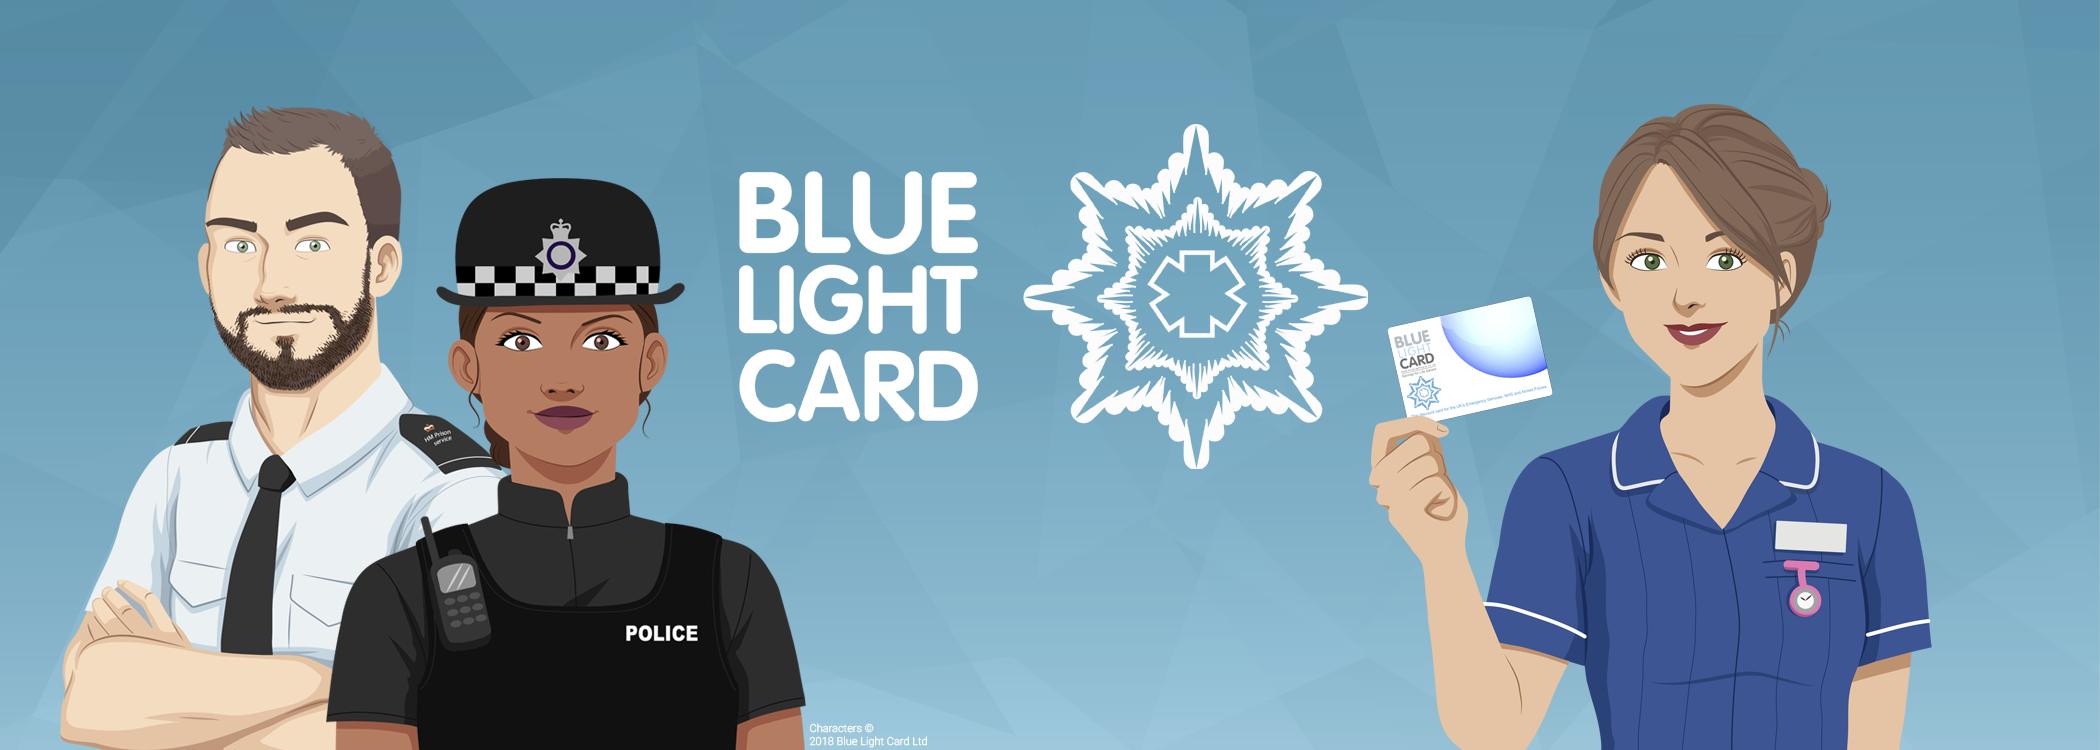 35% off Samsung Home appliances via Bluelightcard